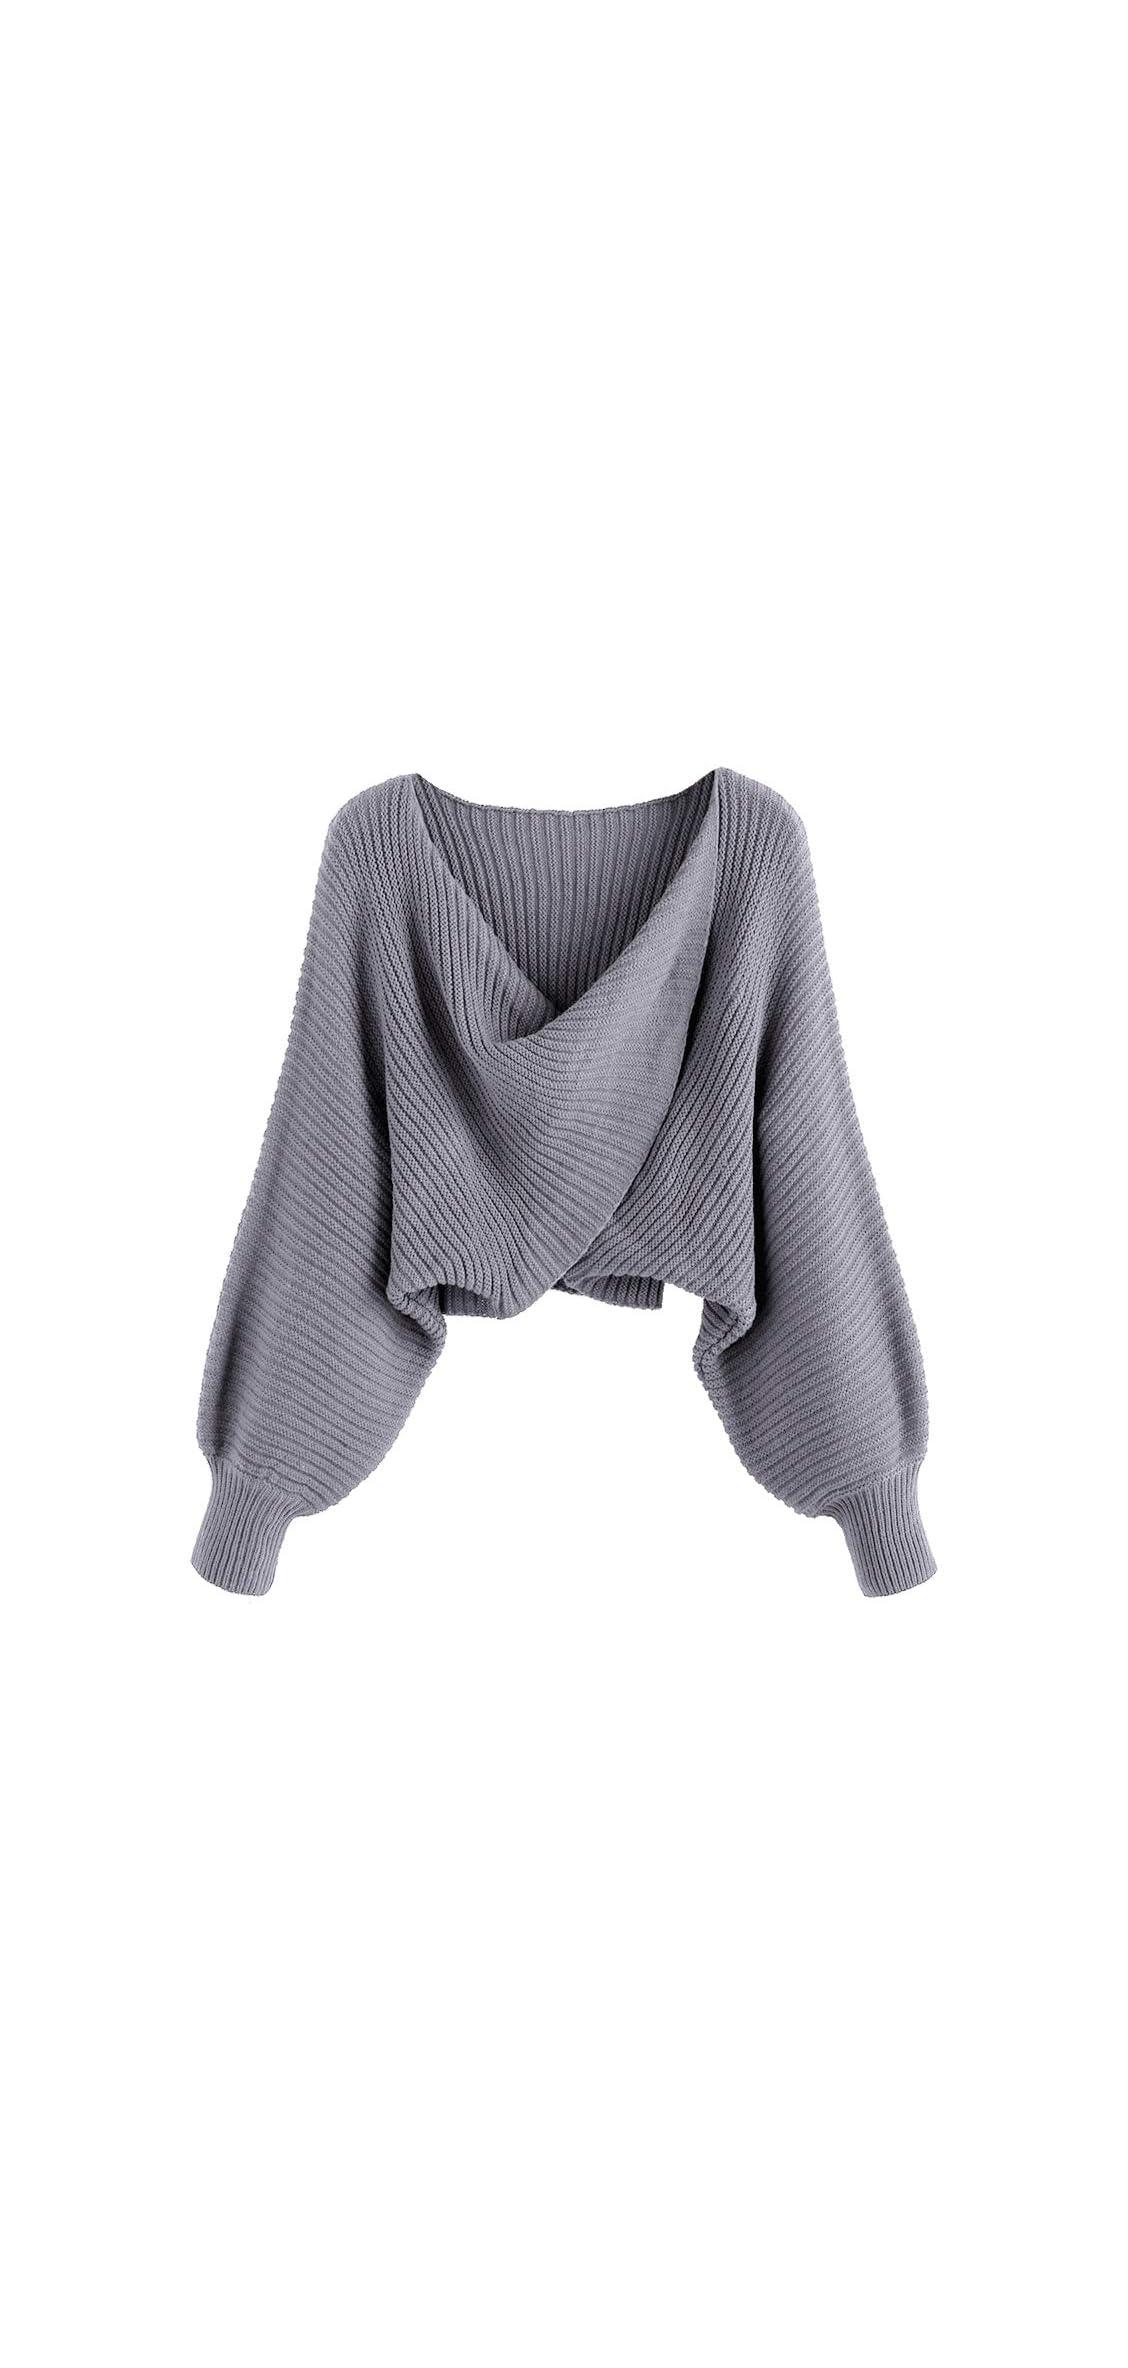 Women's V-neck Asymmetric Twist Pullover Crop Knitted